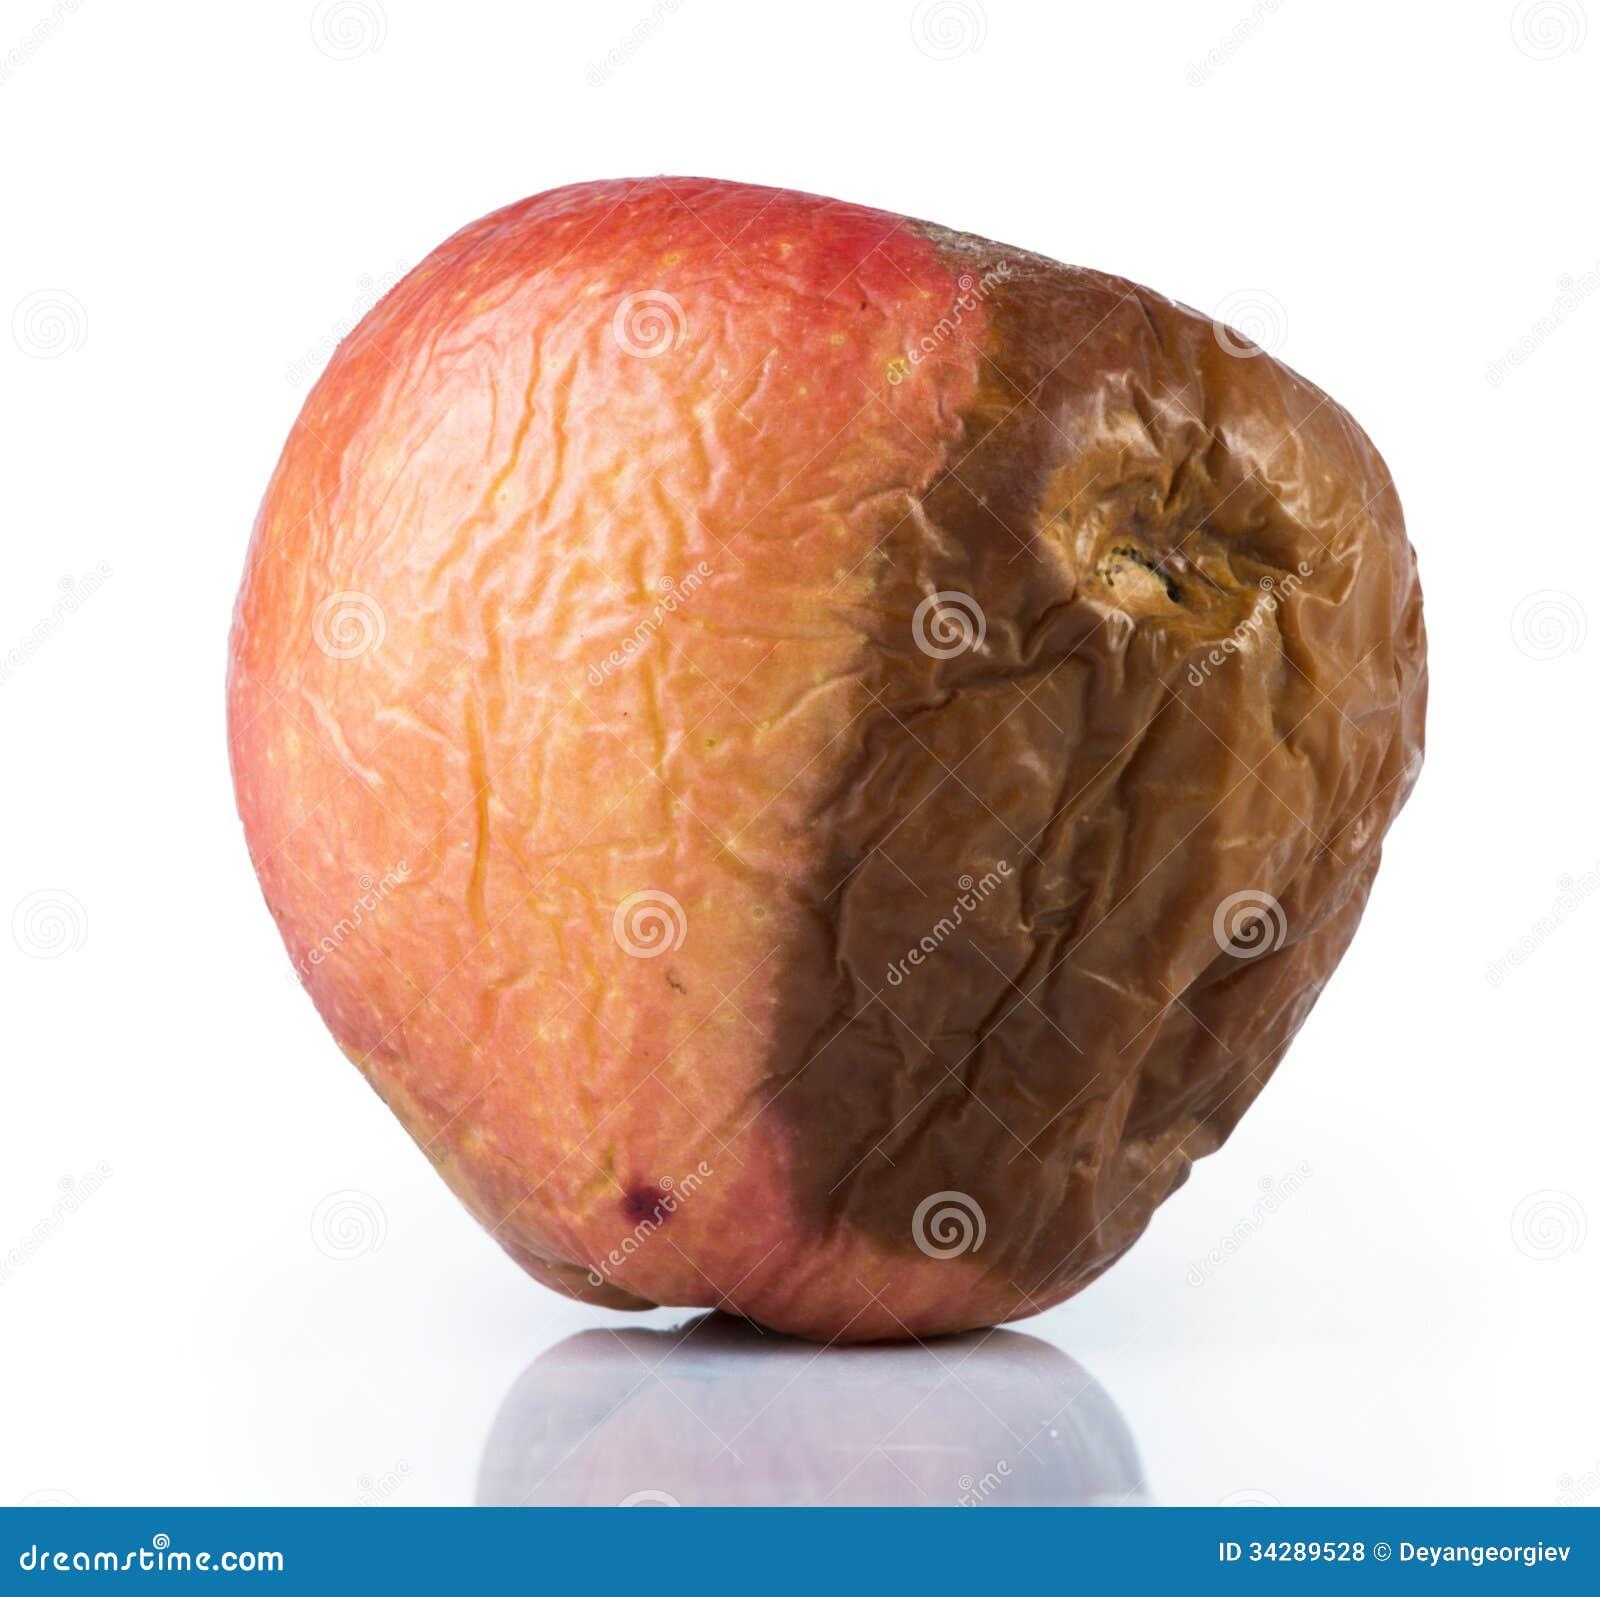 Rotten Apple Royalty Free Stock Photos Image 34289528